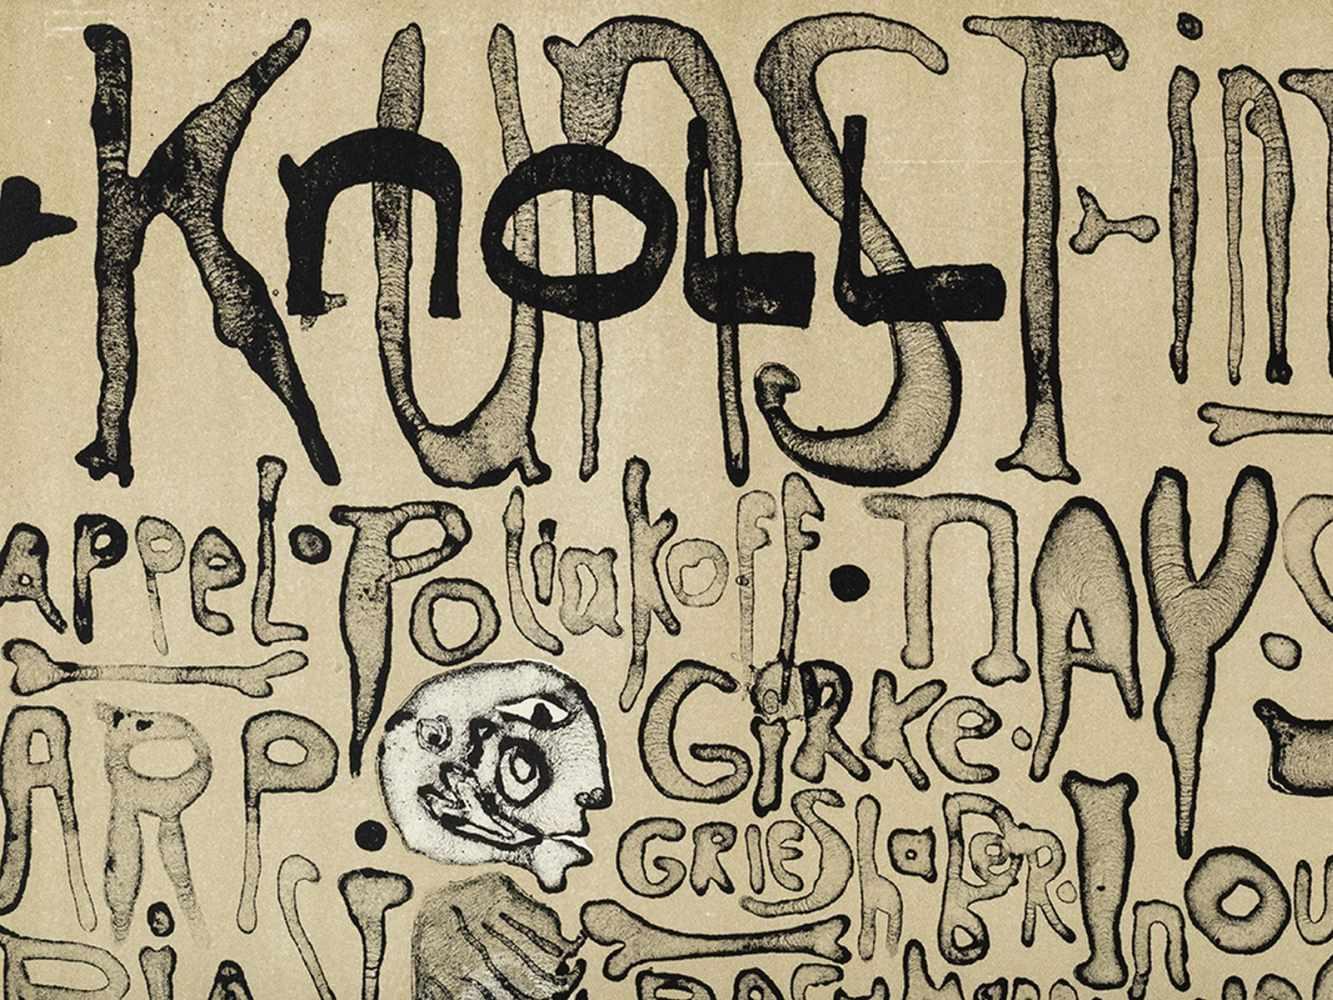 Paul Wunderlich, Kunst + Knoll International, Poster, 1963 - Image 5 of 9